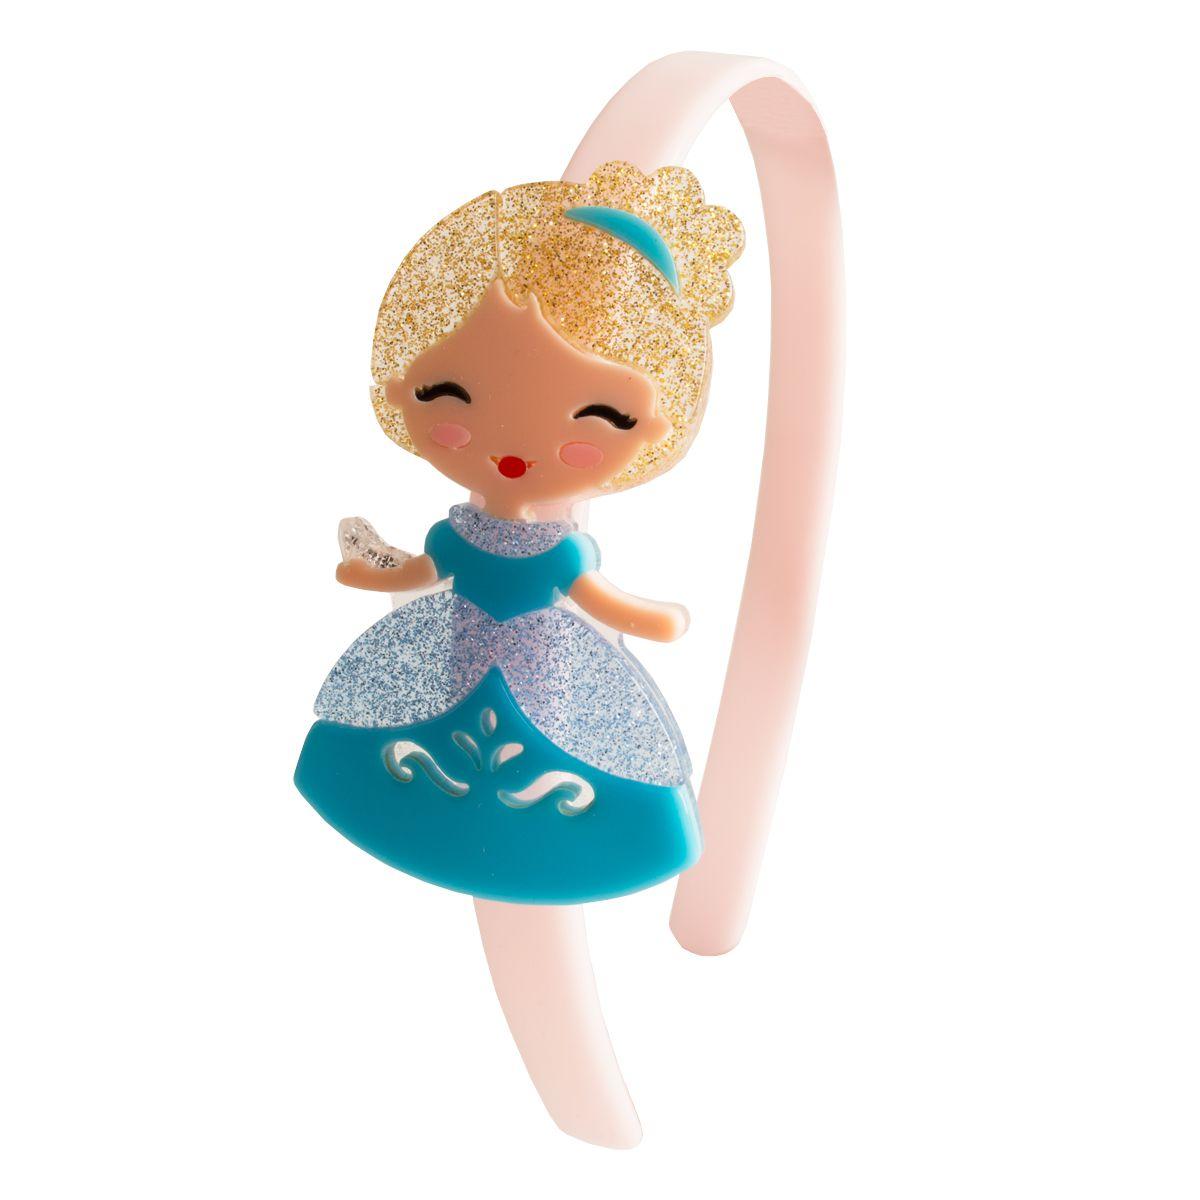 Tiara infantil de princesa acrílico